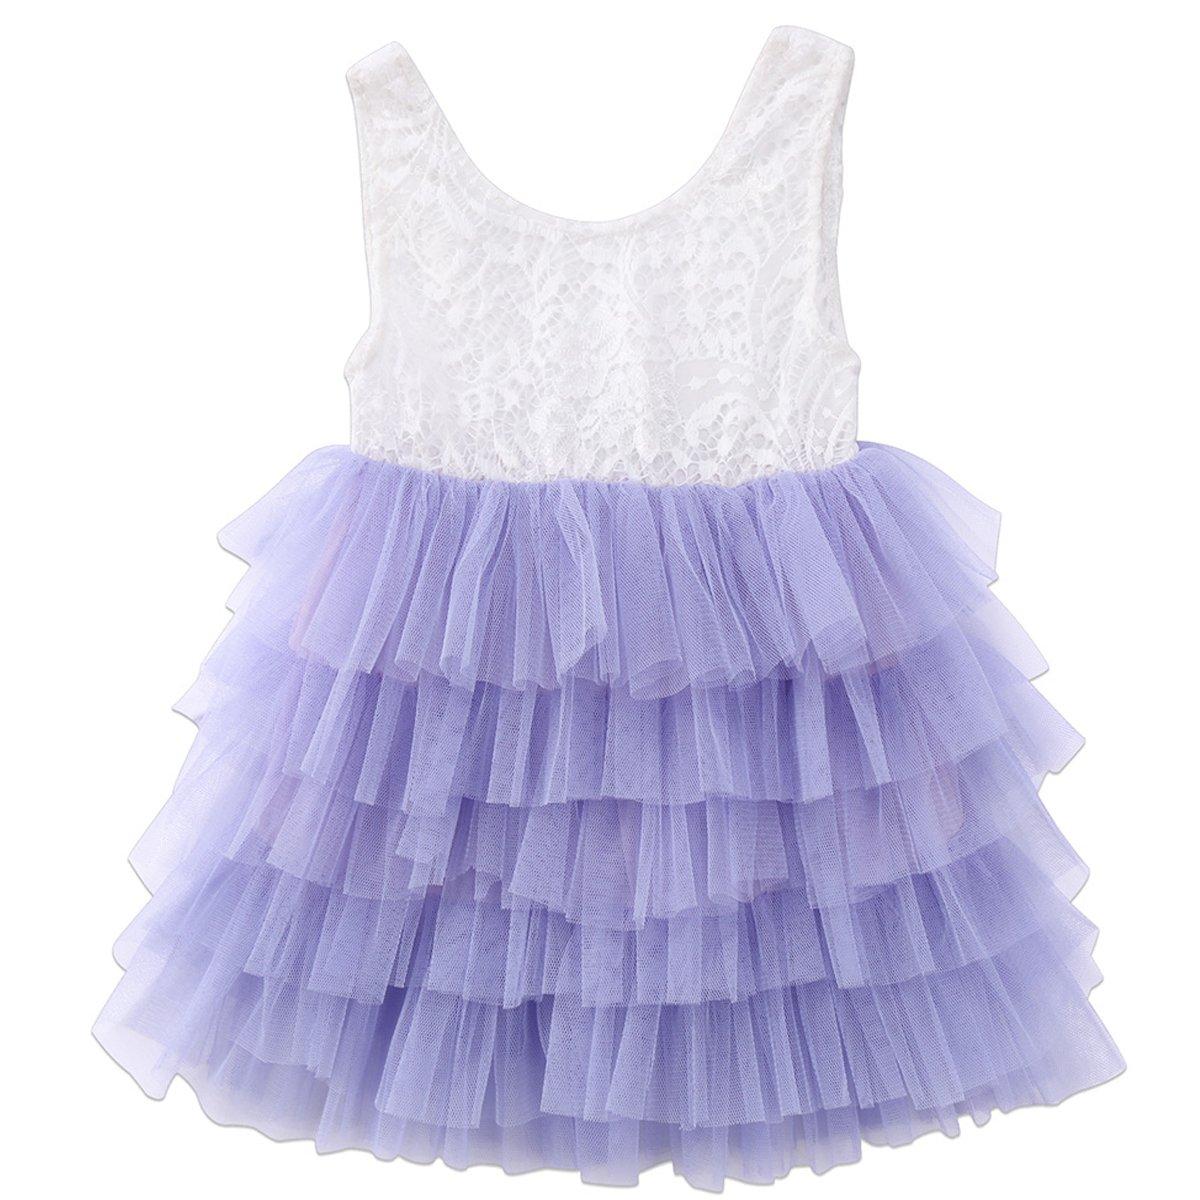 Annvivi Baby Girls Lace Tutu Tulle Princess Wedding Flower Girl Birthday Party Dress